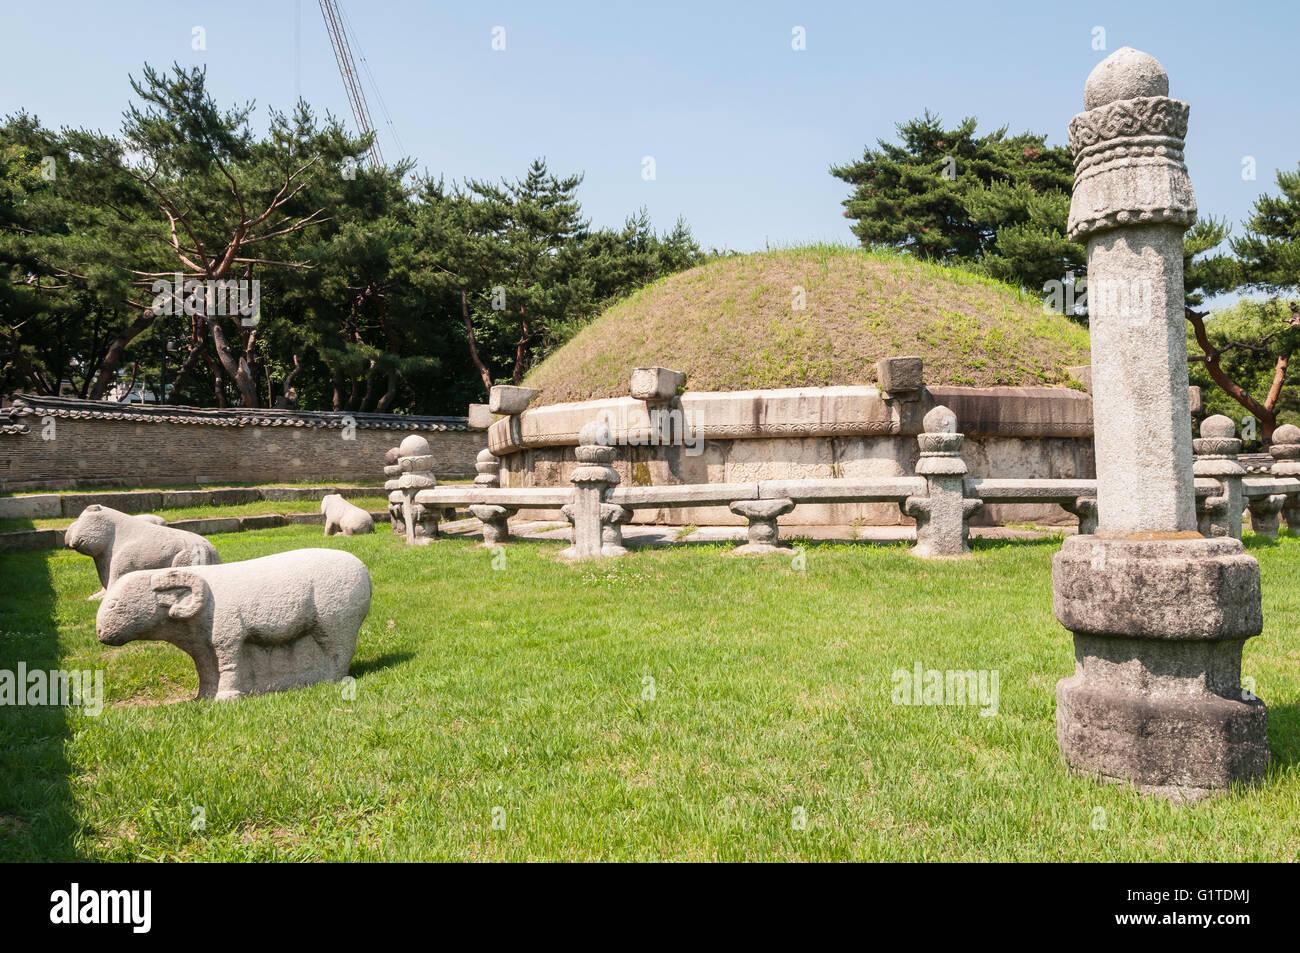 Tomb of King Sejong the Great, Royal Tombs of the Joseon Dynasty, 1392-1910,  Seolleung Park, Seoul, South Korea;